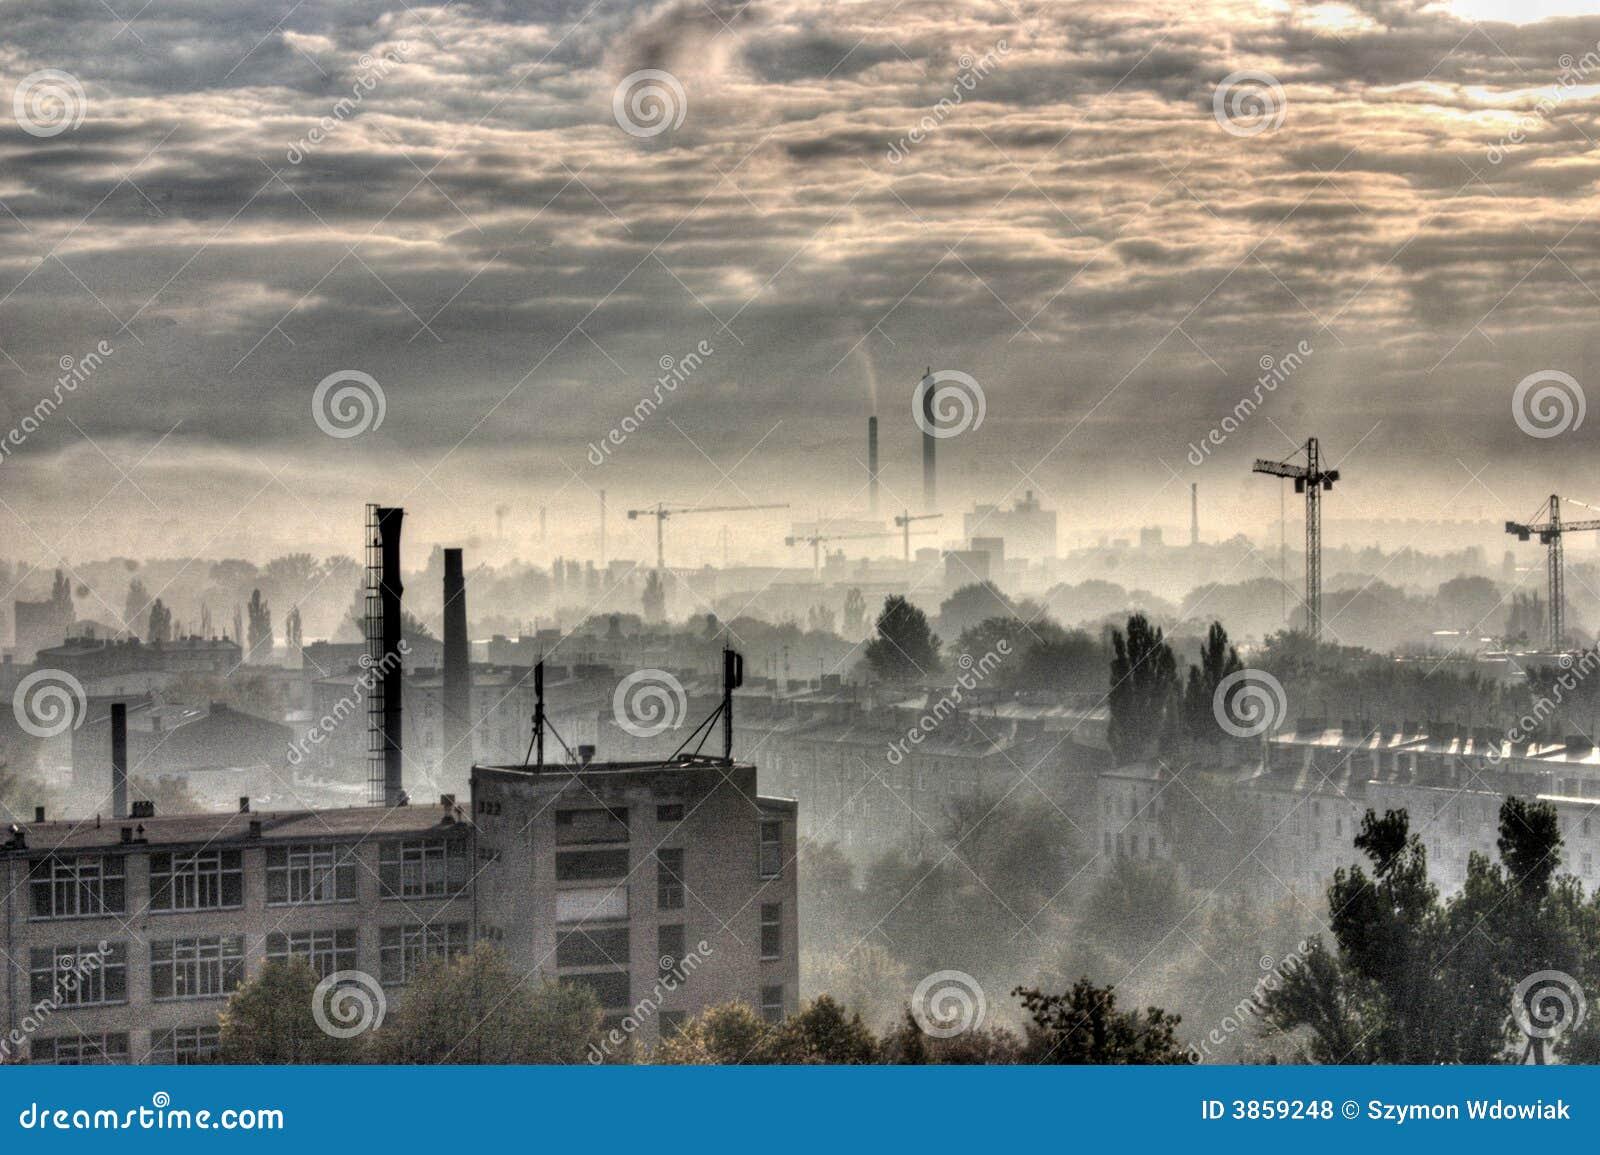 Industriële Stad - Moonscape